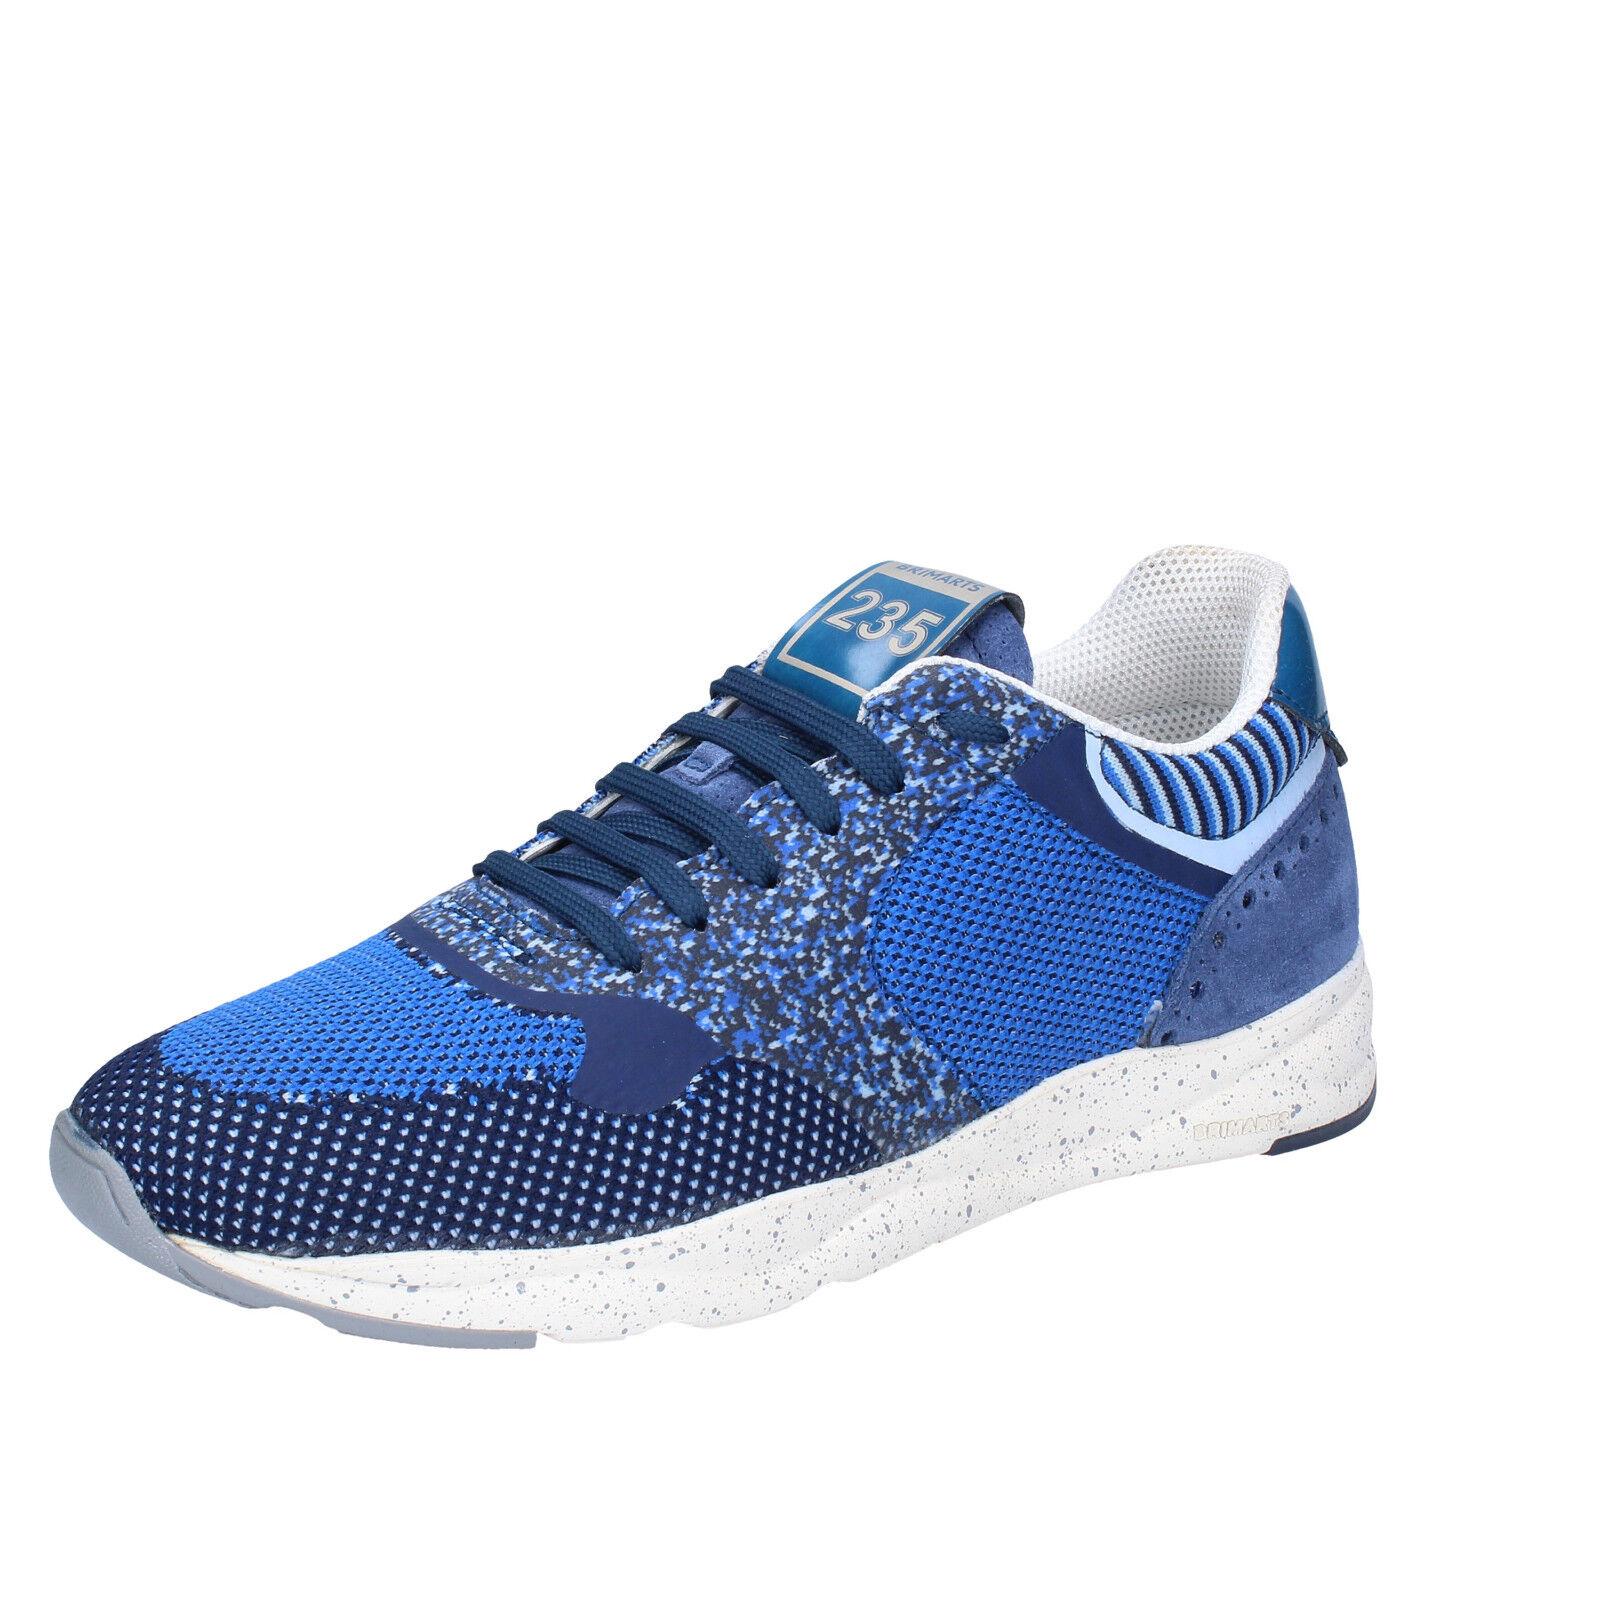 Scarpe uomo BRIMARTS 40 EU scarpe da ginnastica blu tessuto camoscio BT424-40